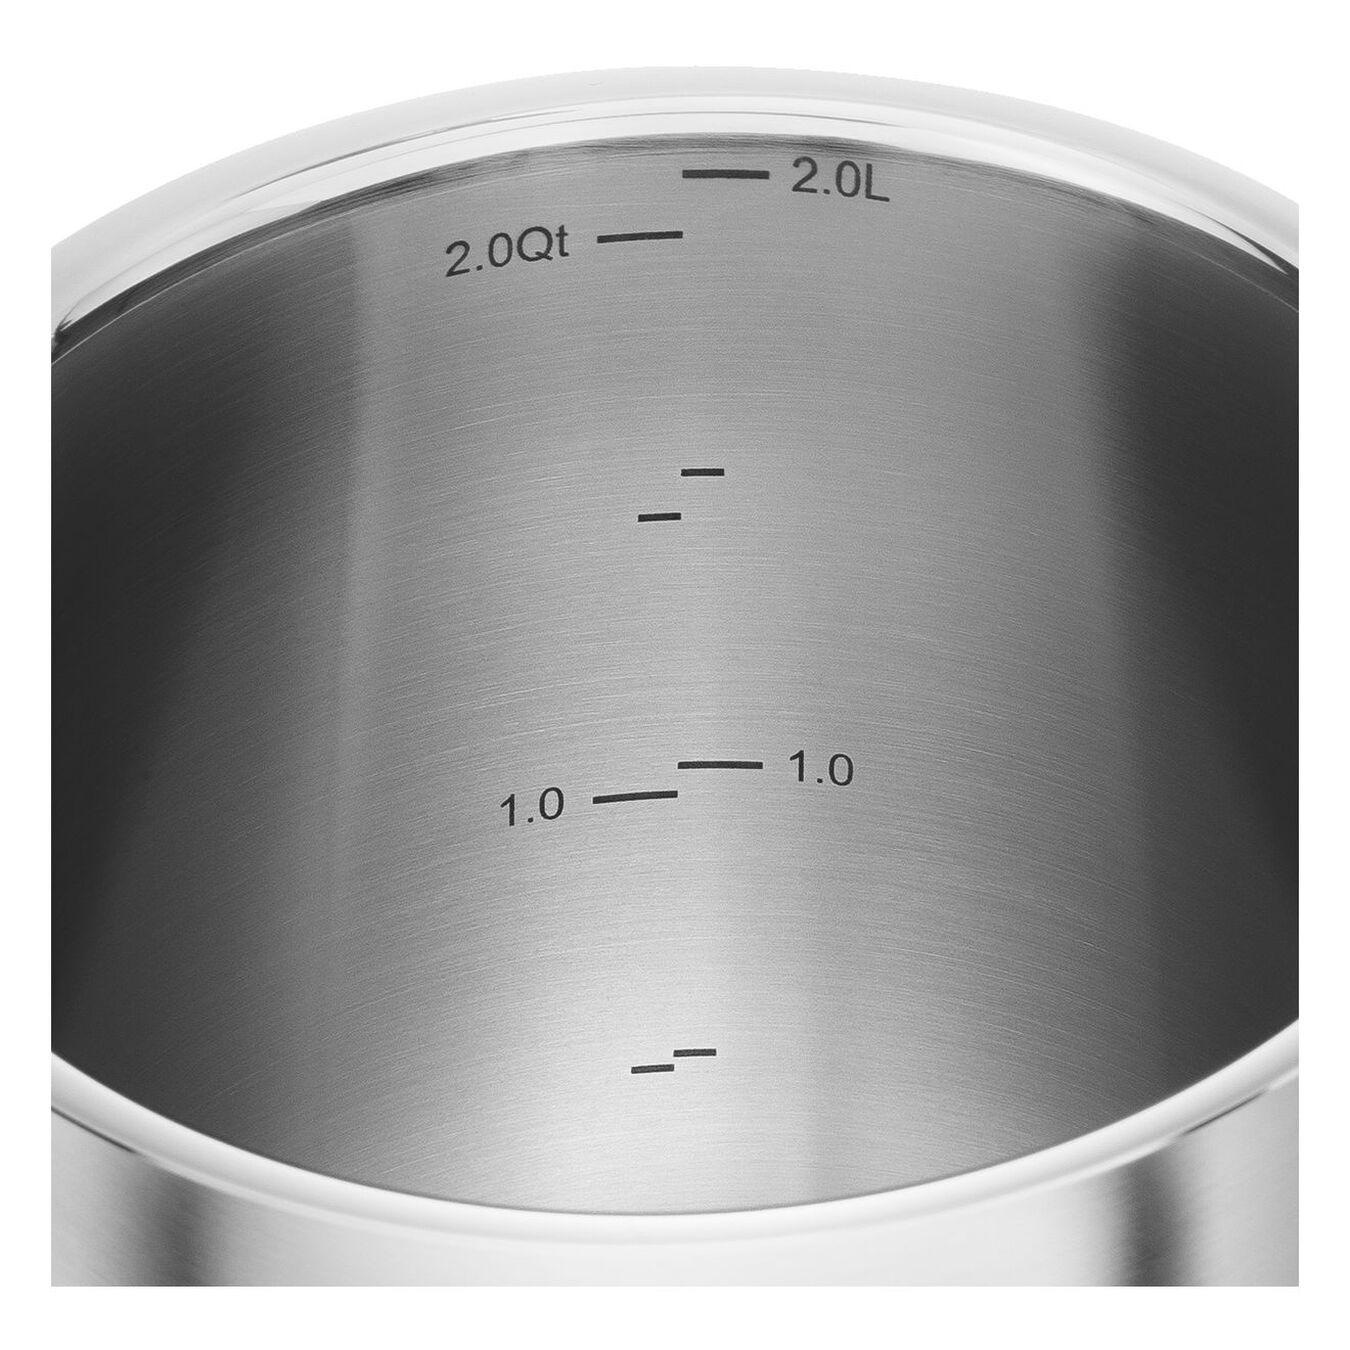 Bricco - 2 l, 18/10 Acciaio inossidabile,,large 4